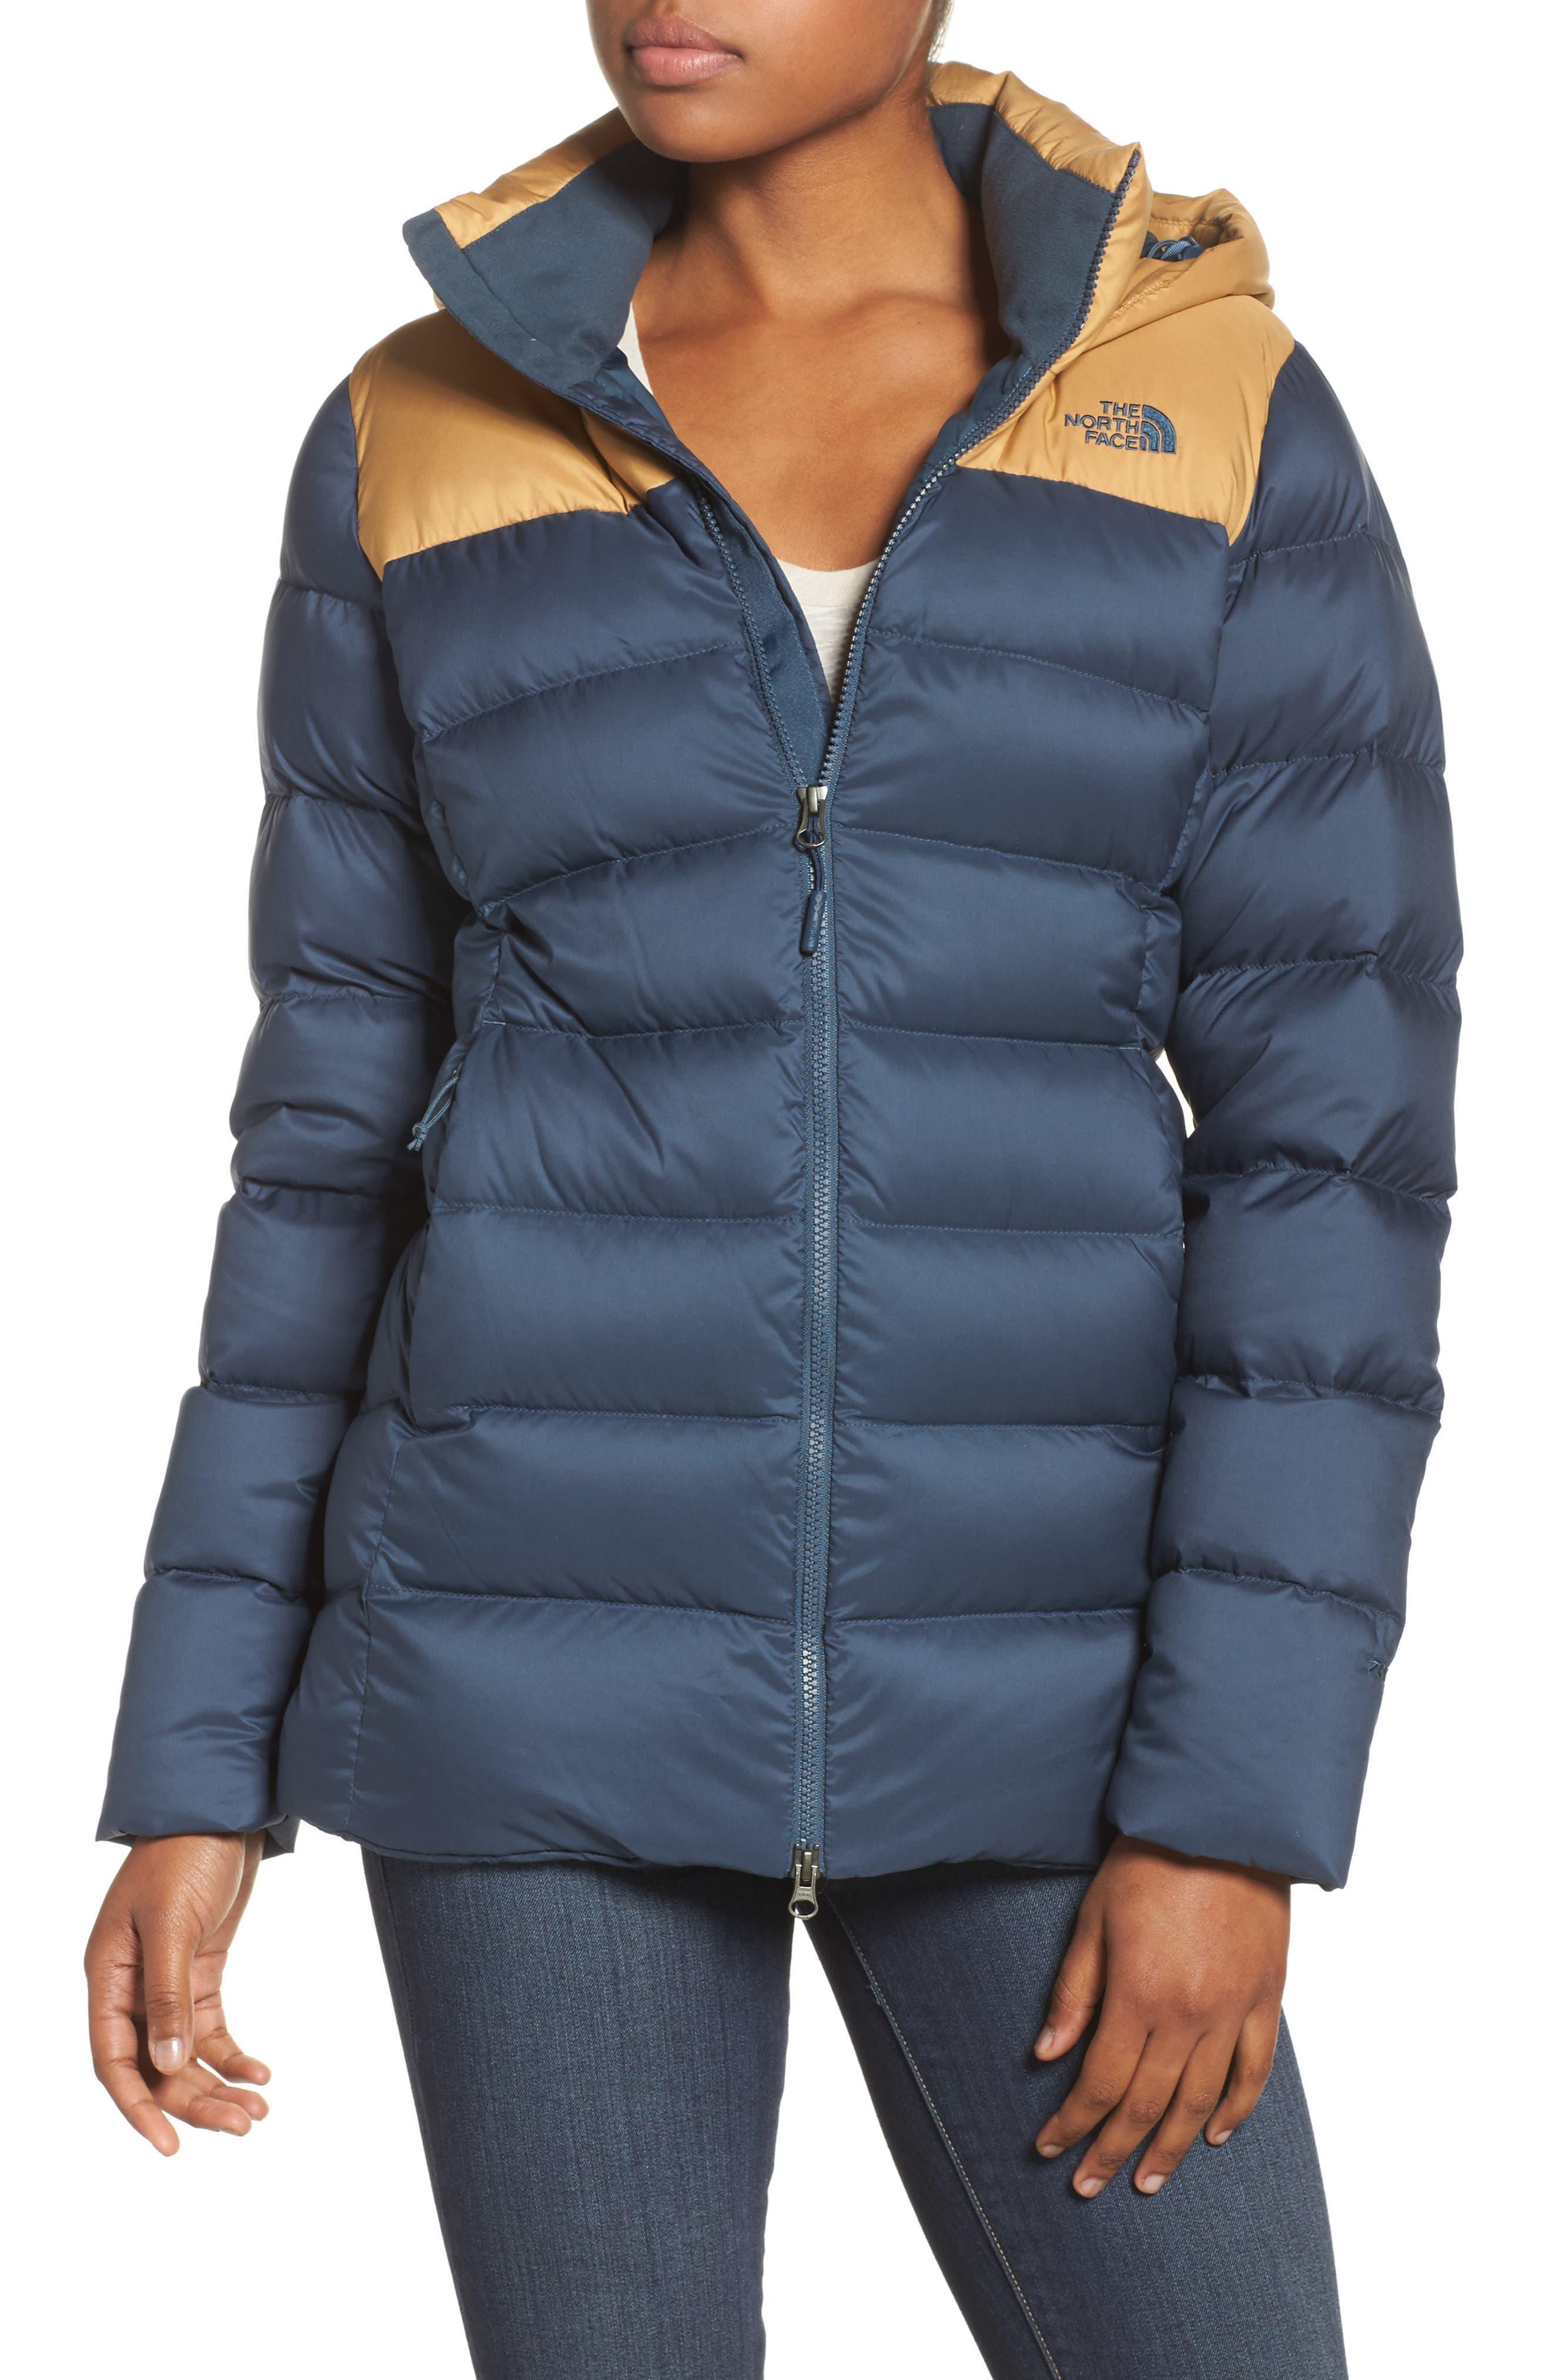 Nupste Ridge Down Jacket,                         Main,                         color, Ink Blue/ Biscuit Tan